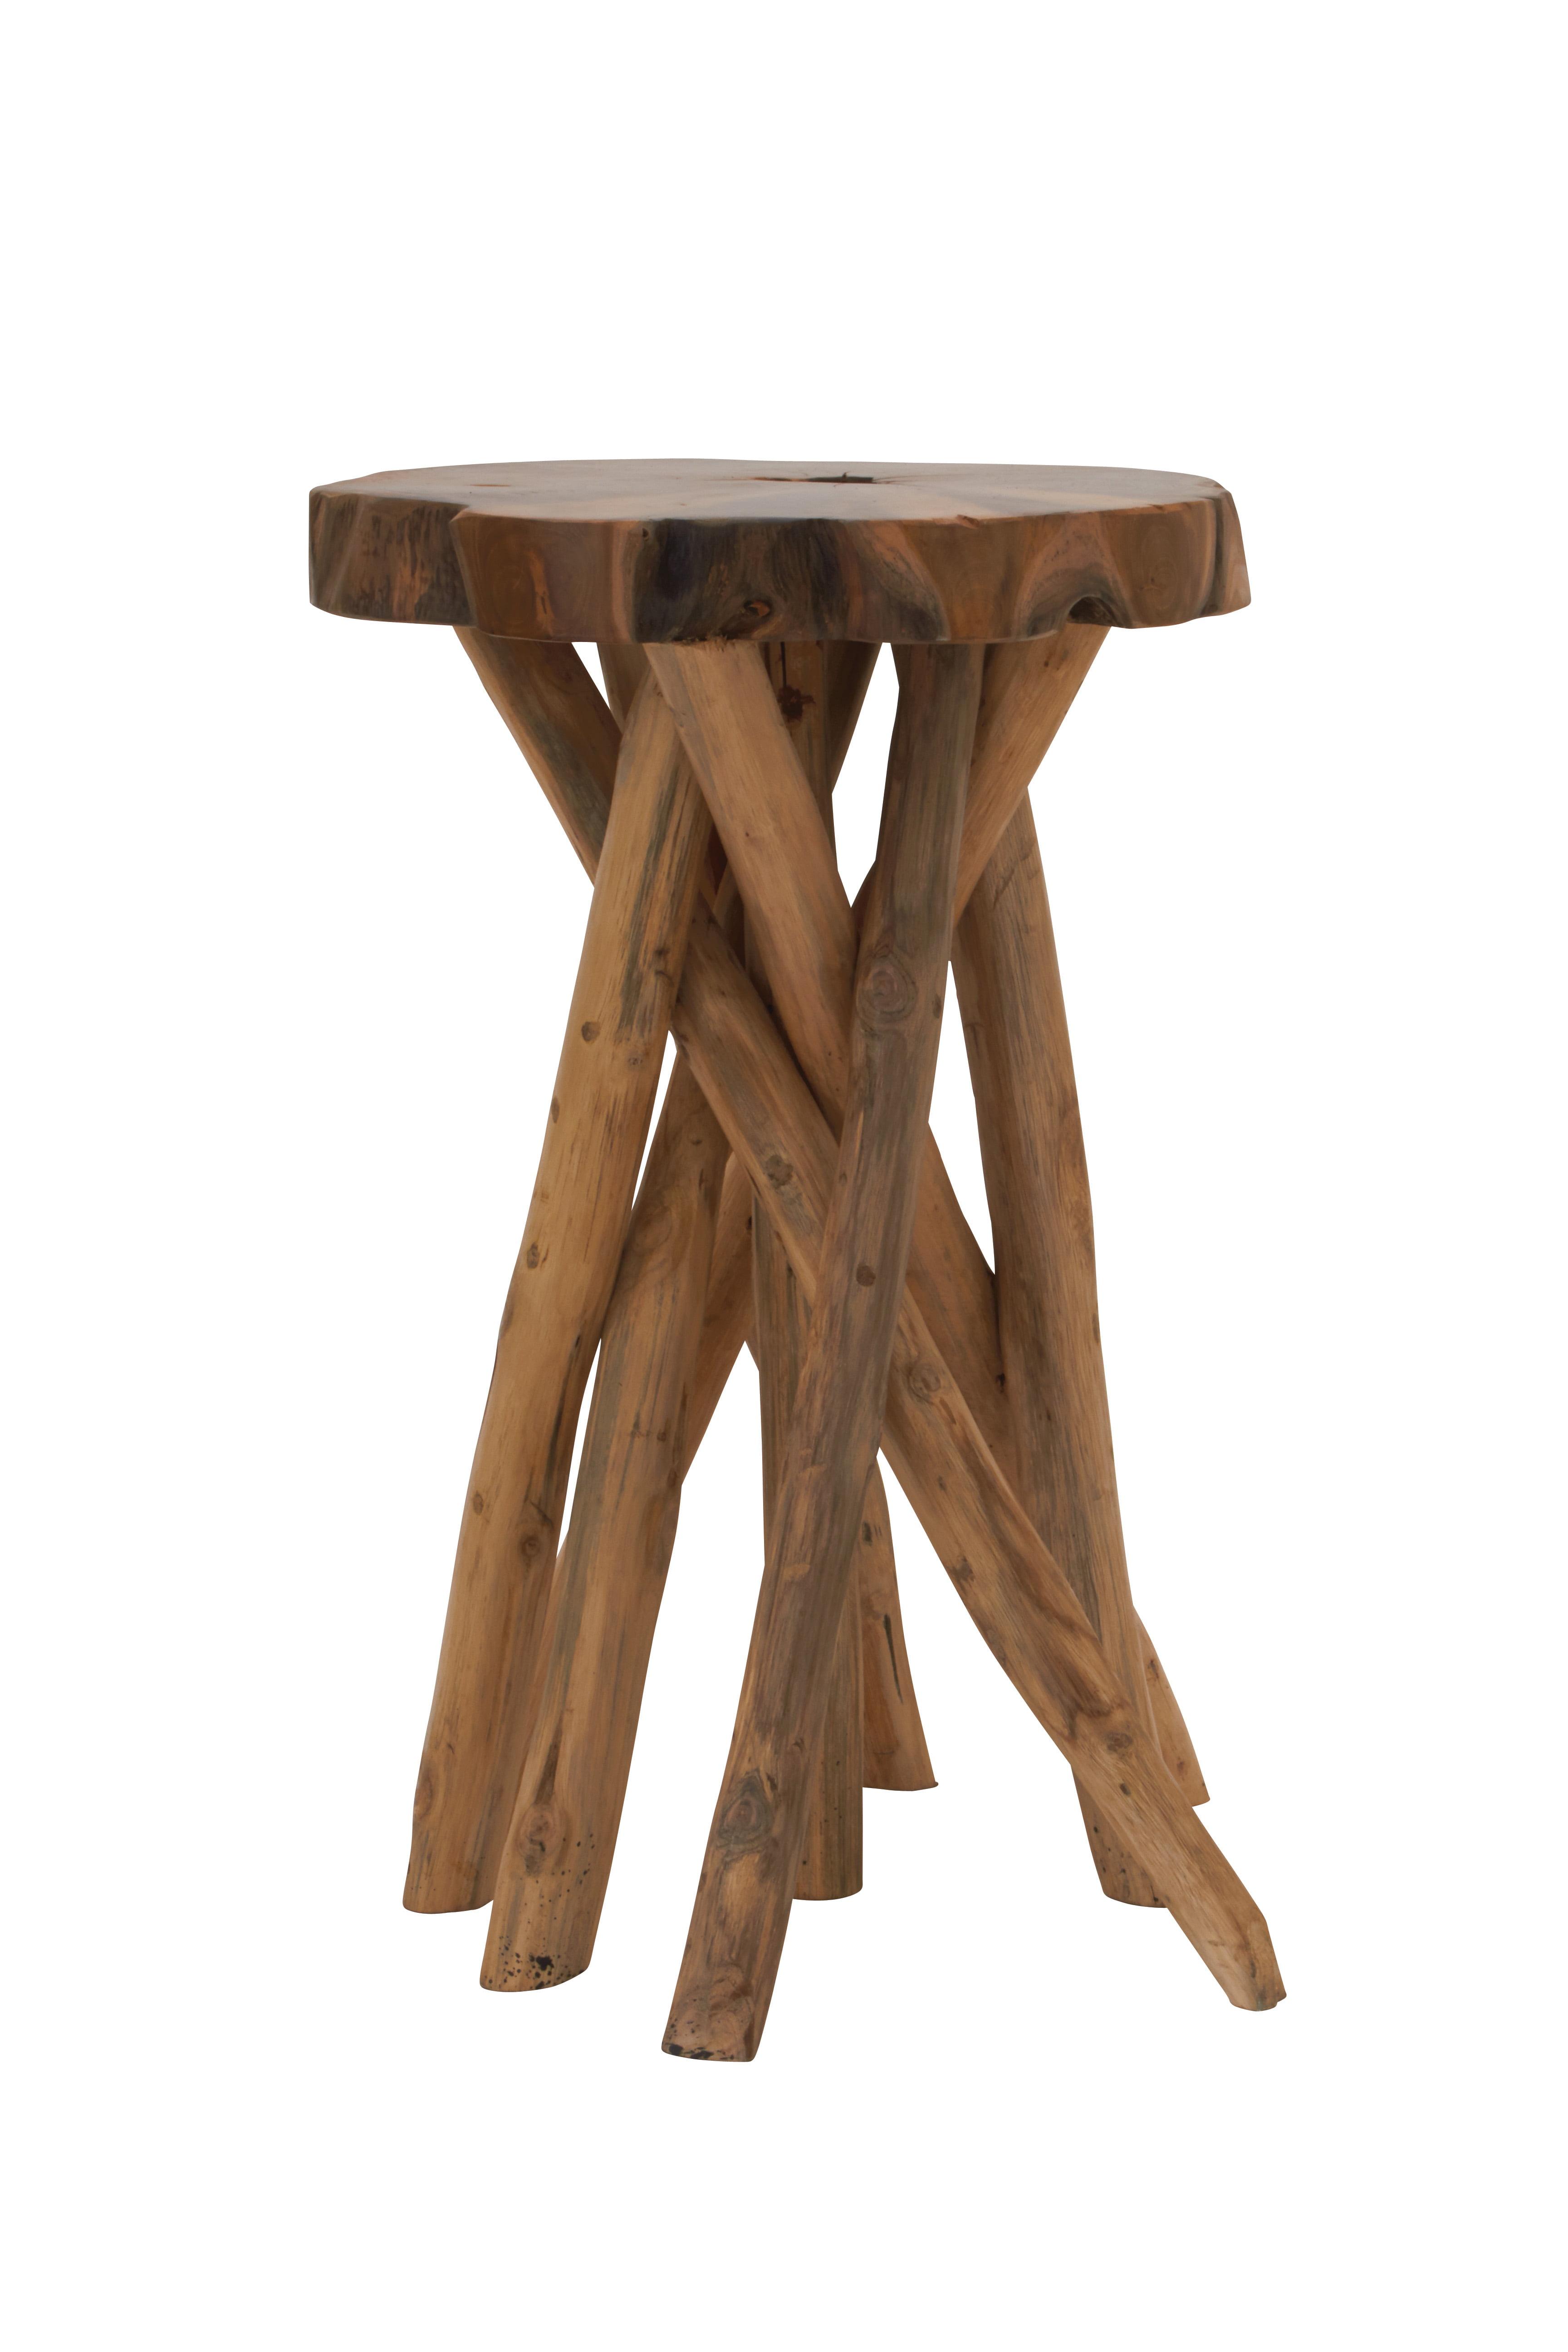 Distinctive Teak Wood Small Stool by Benzara